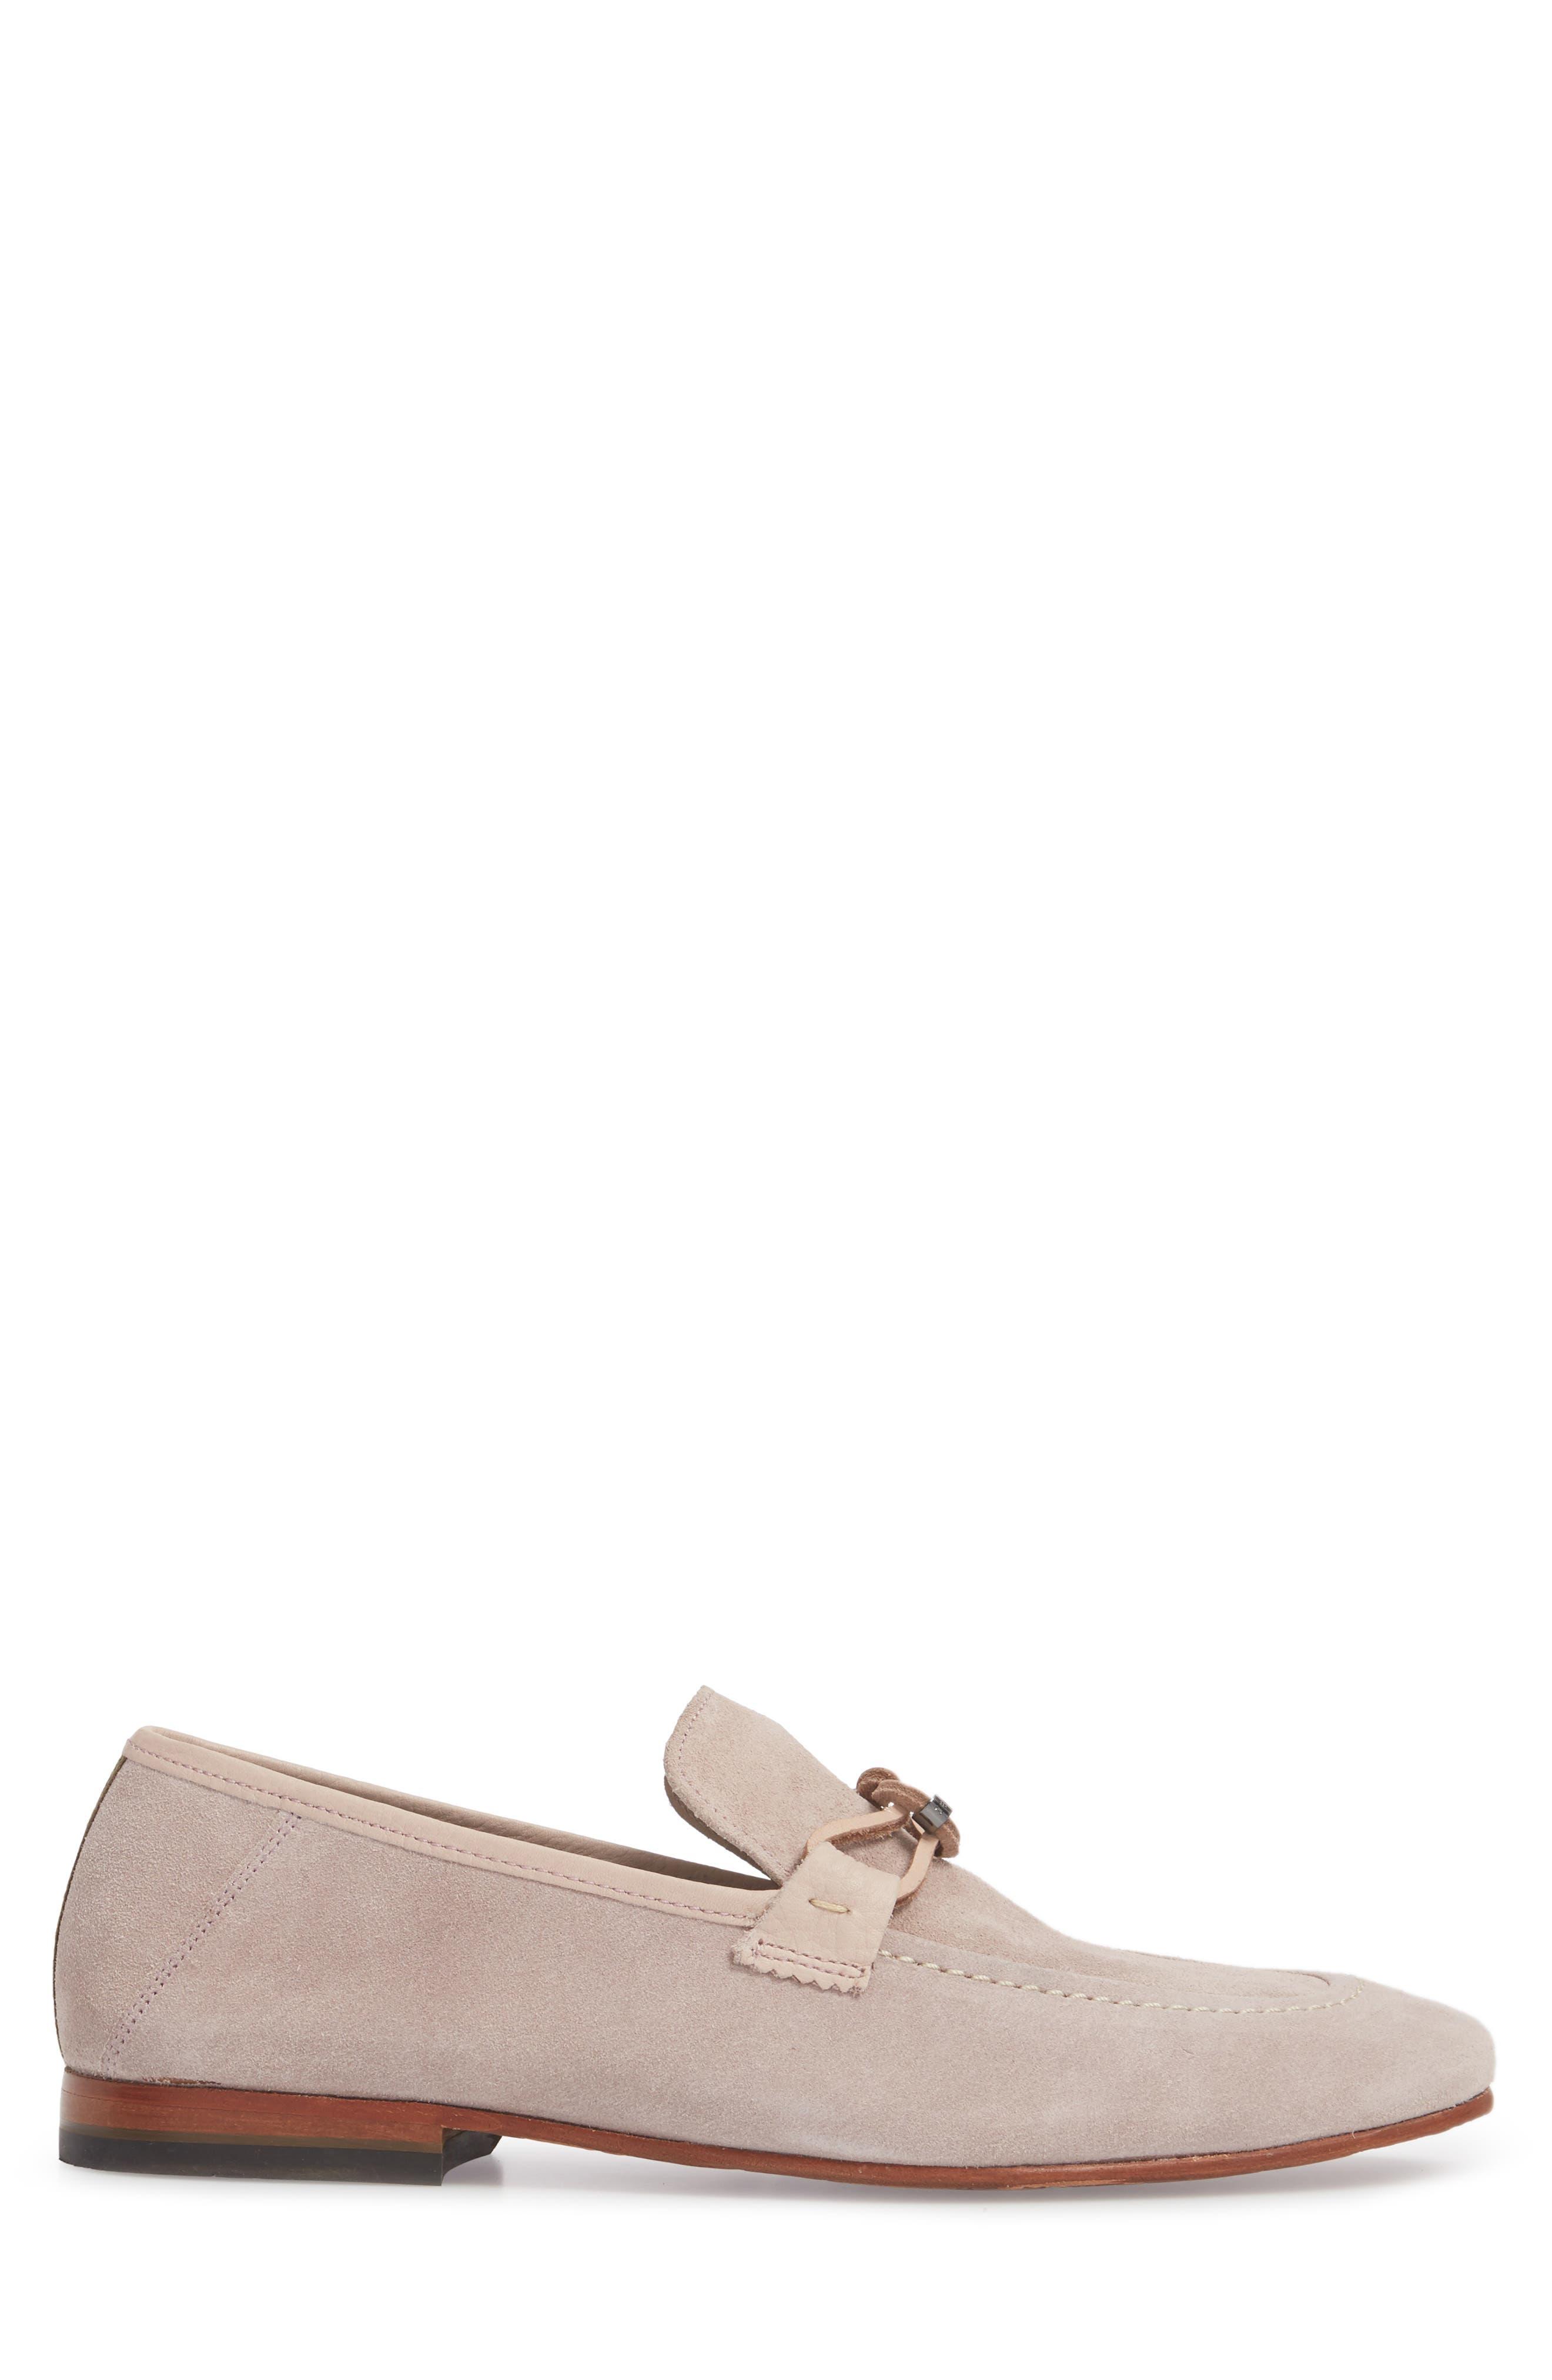 Hoppken Convertible Knotted Loafer,                             Alternate thumbnail 3, color,                             Light Pink Suede